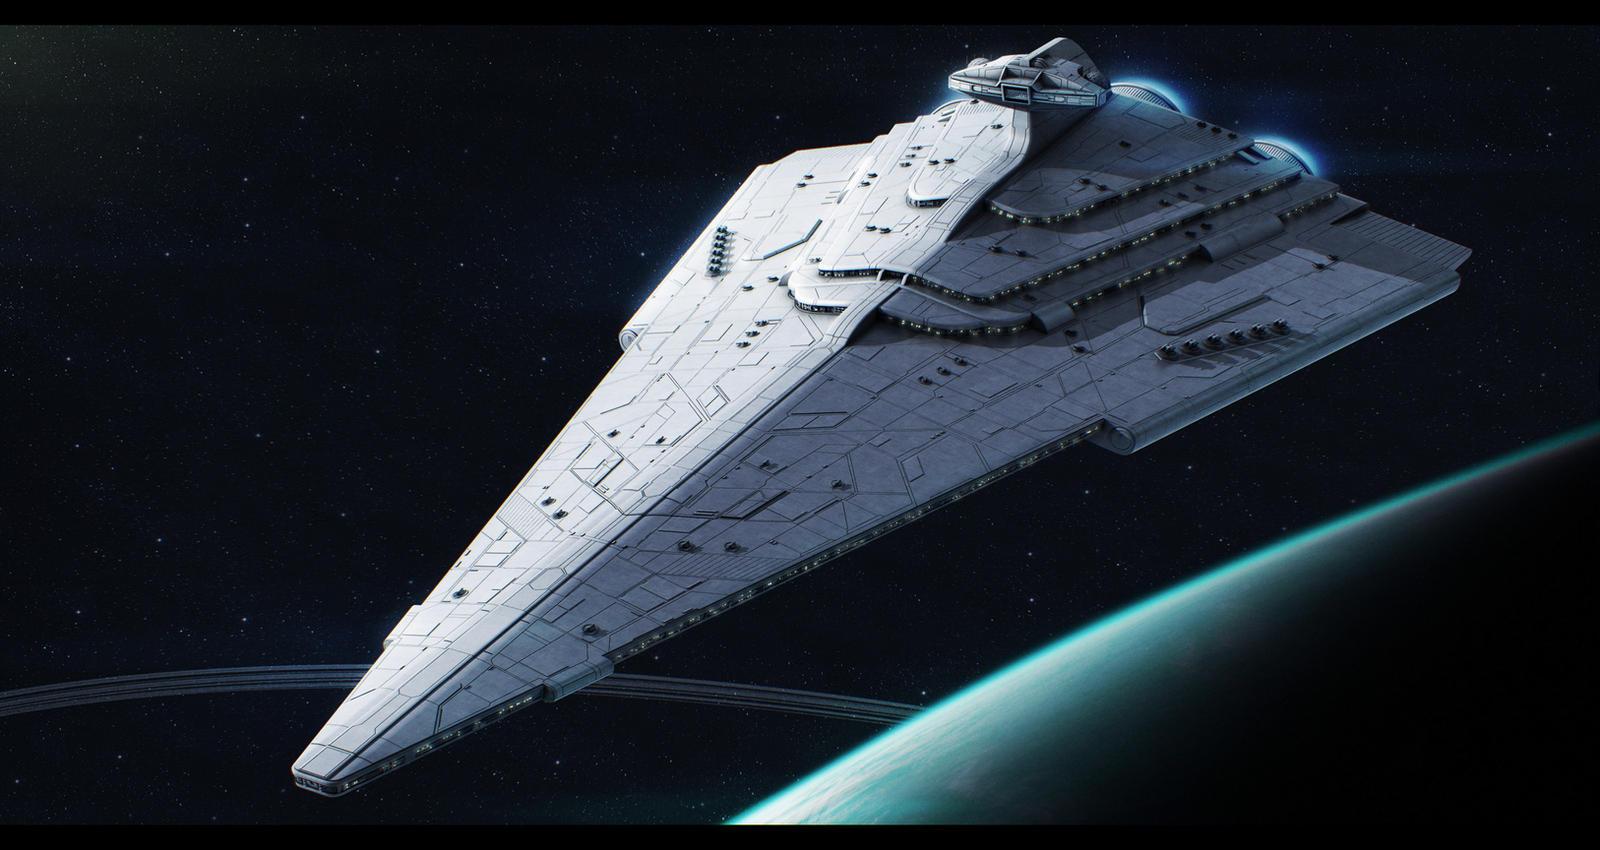 Rendili StarDrive Victory-III-class star destroyer by Shoguneagle